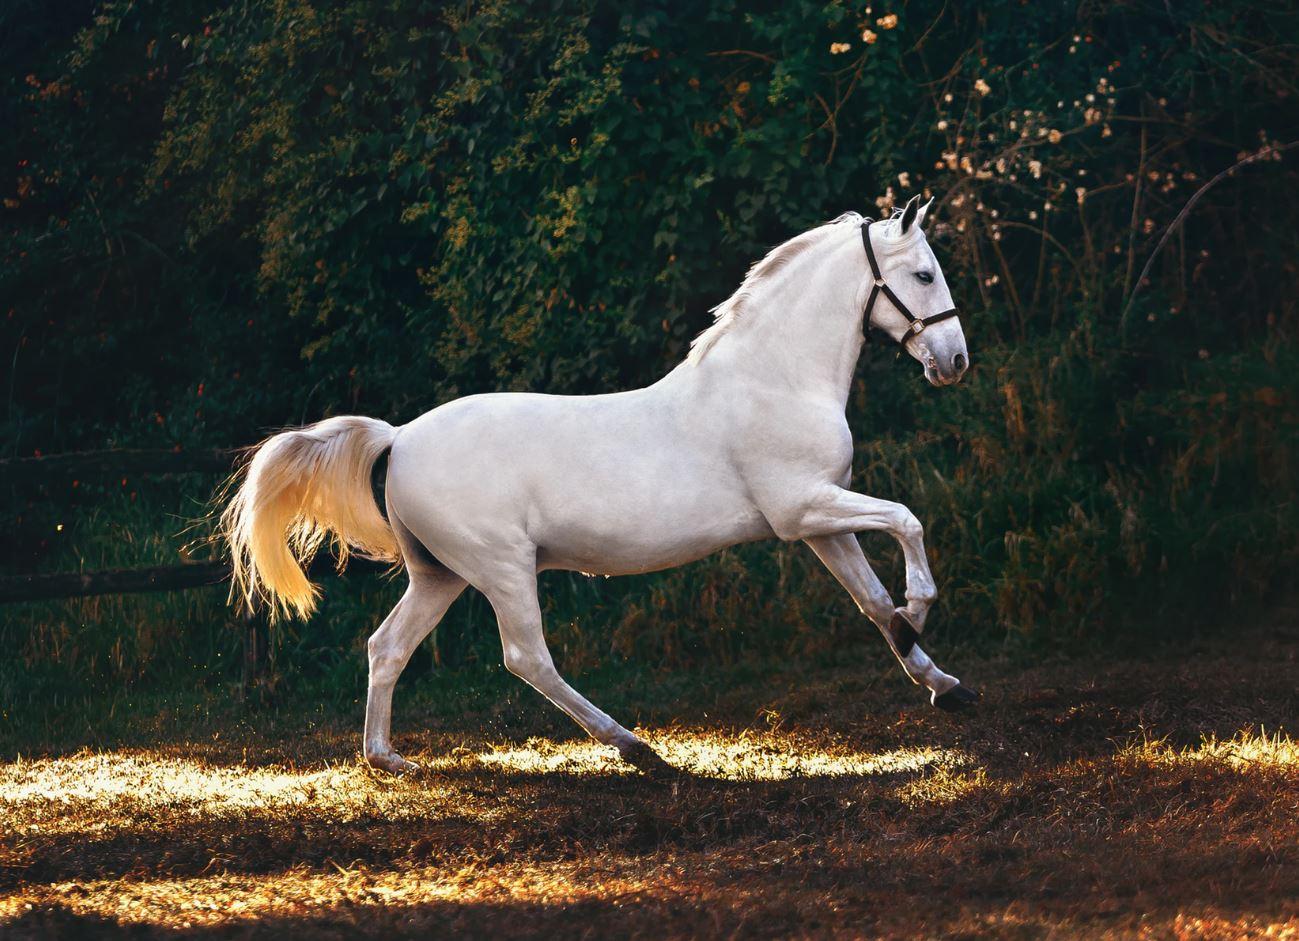 "A horse, a horse, my kingdom for a horse!"" by Tim Faith - Debbie Wilson"